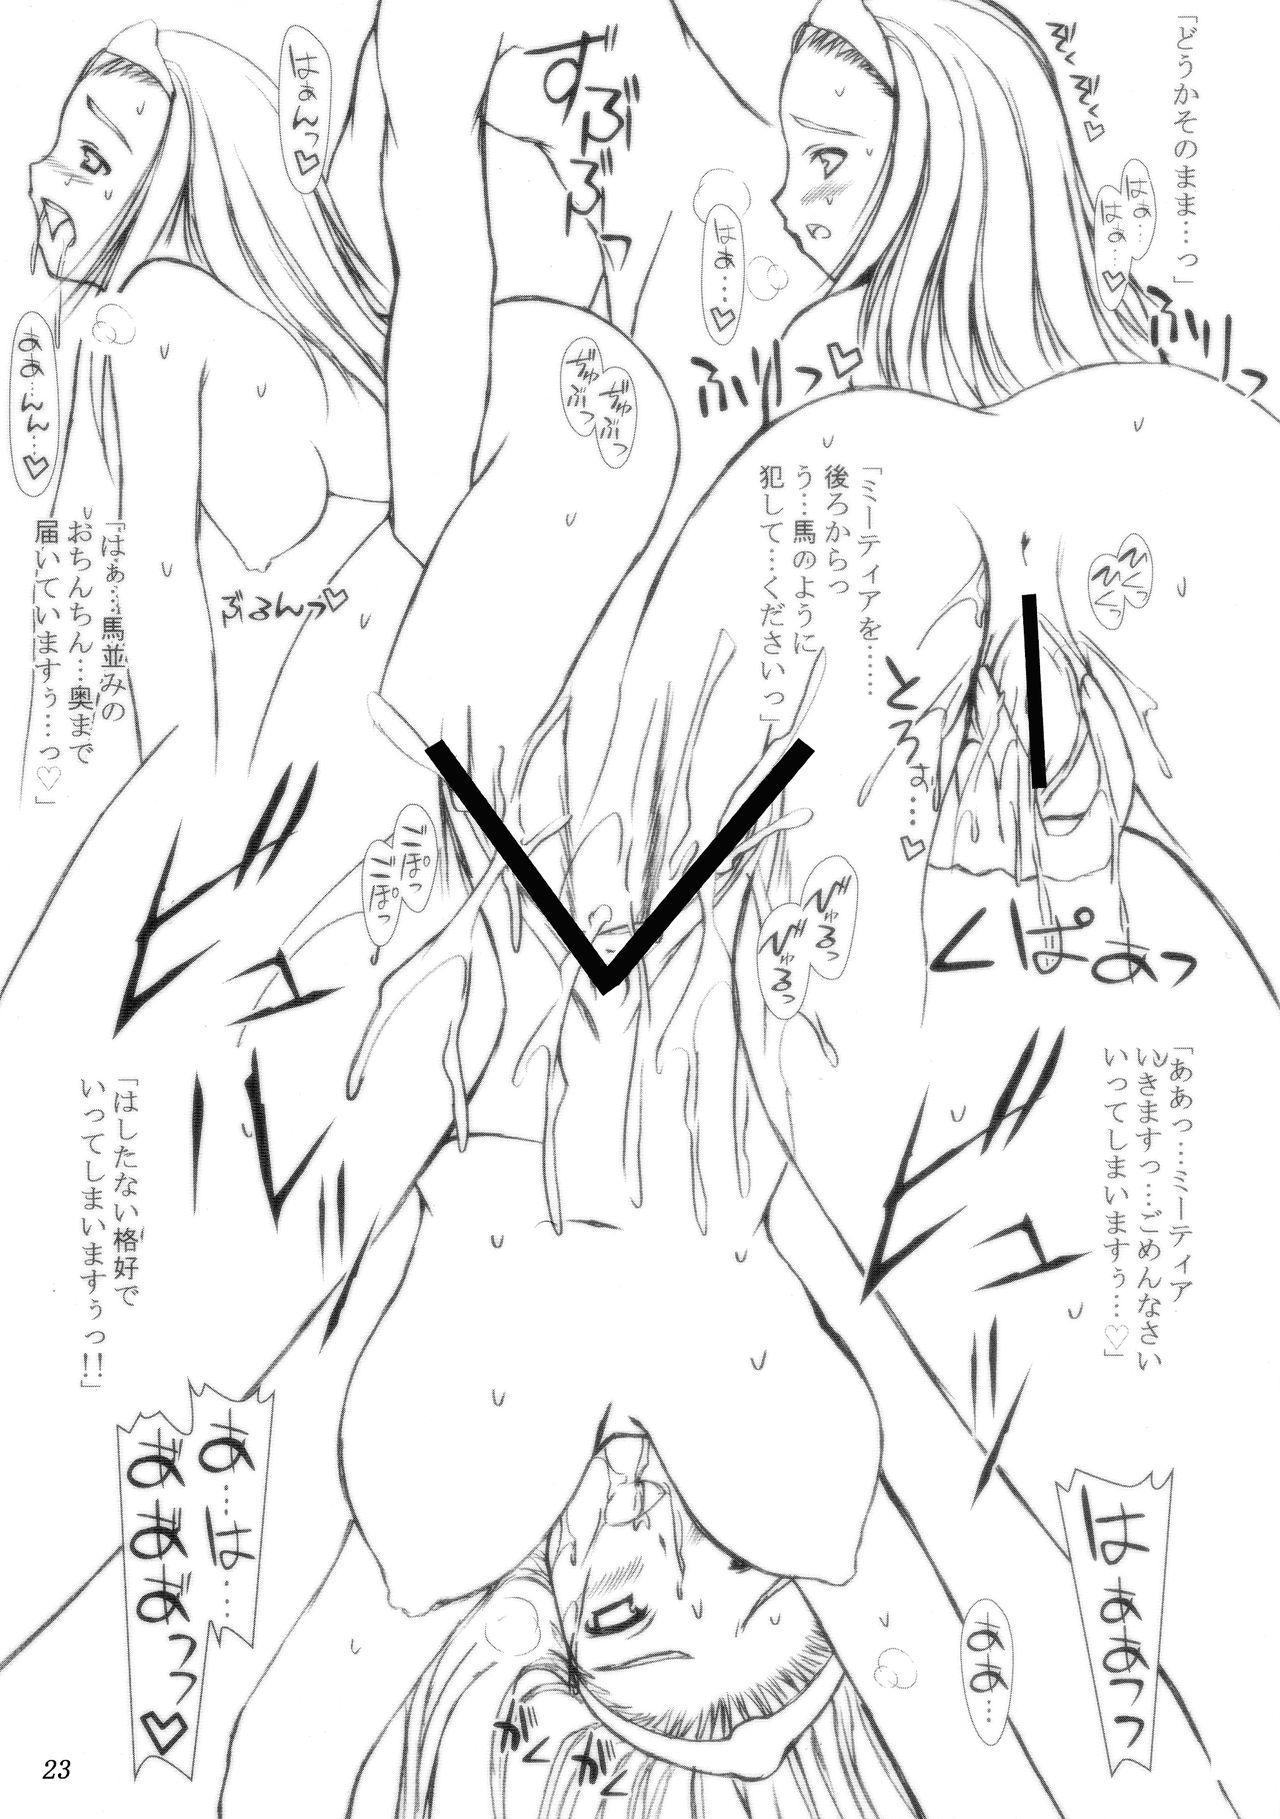 (C73) [ashitakara-ganbaru (Yameta Takashi)] ZIG-ZIG-ZIG 3 -2004~2005- (Various) 22